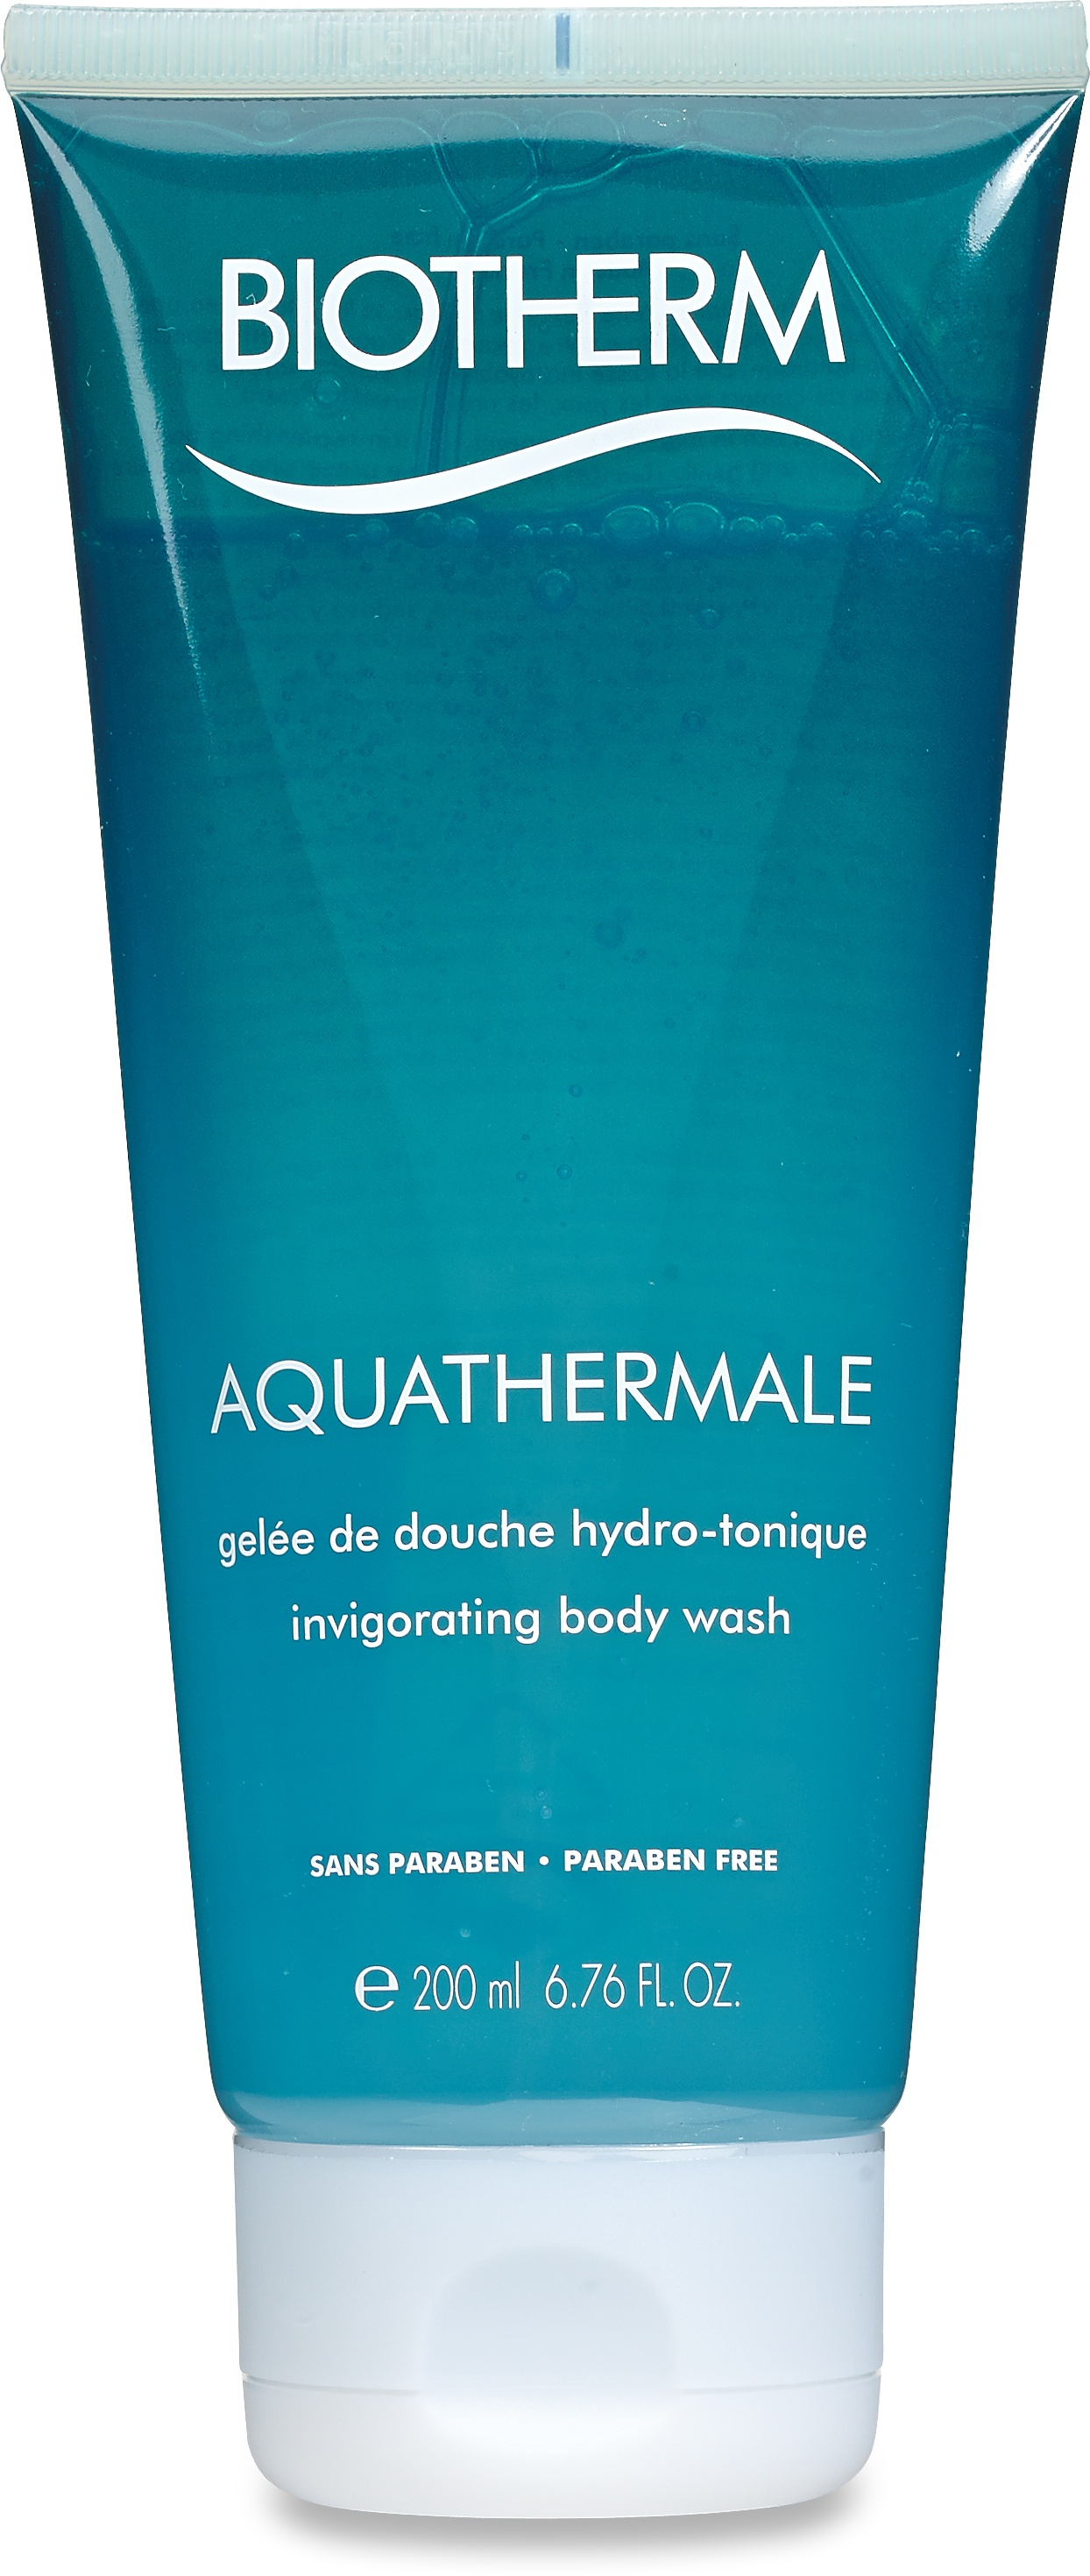 Biotherm Aquathermale Invigorating Body Wash, 200 ml